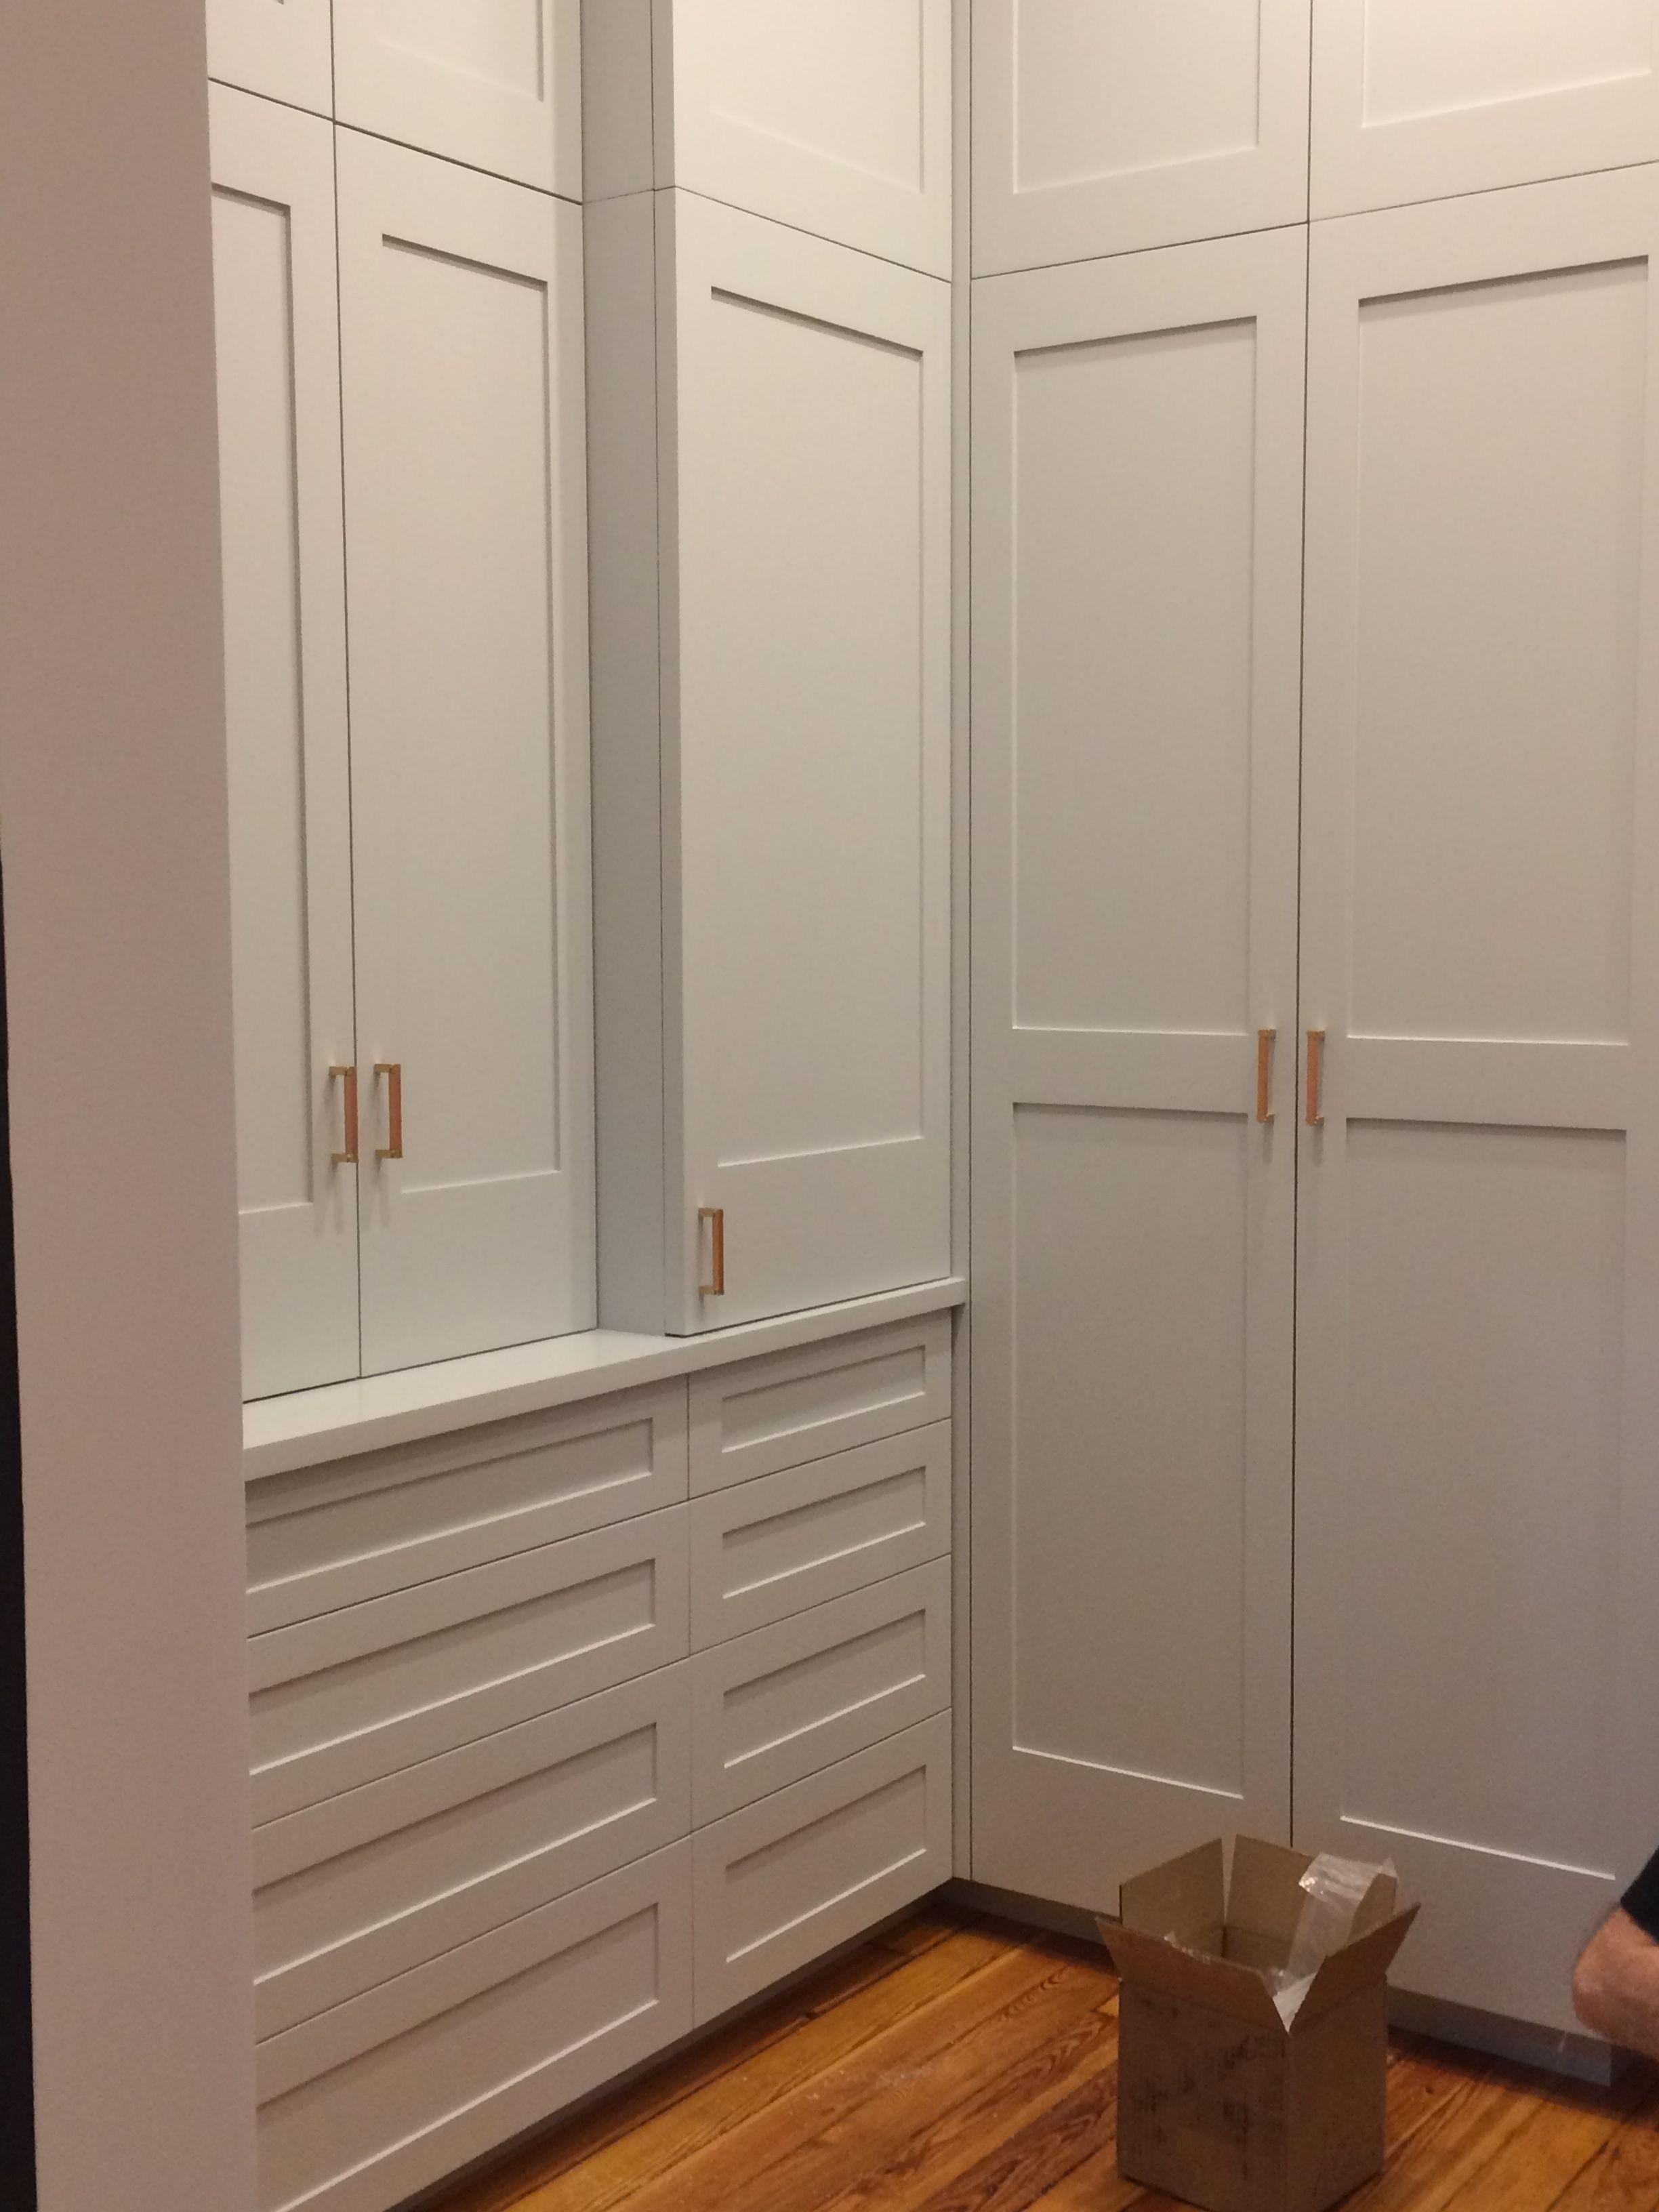 My closet Tall storage, drawers, Home decor